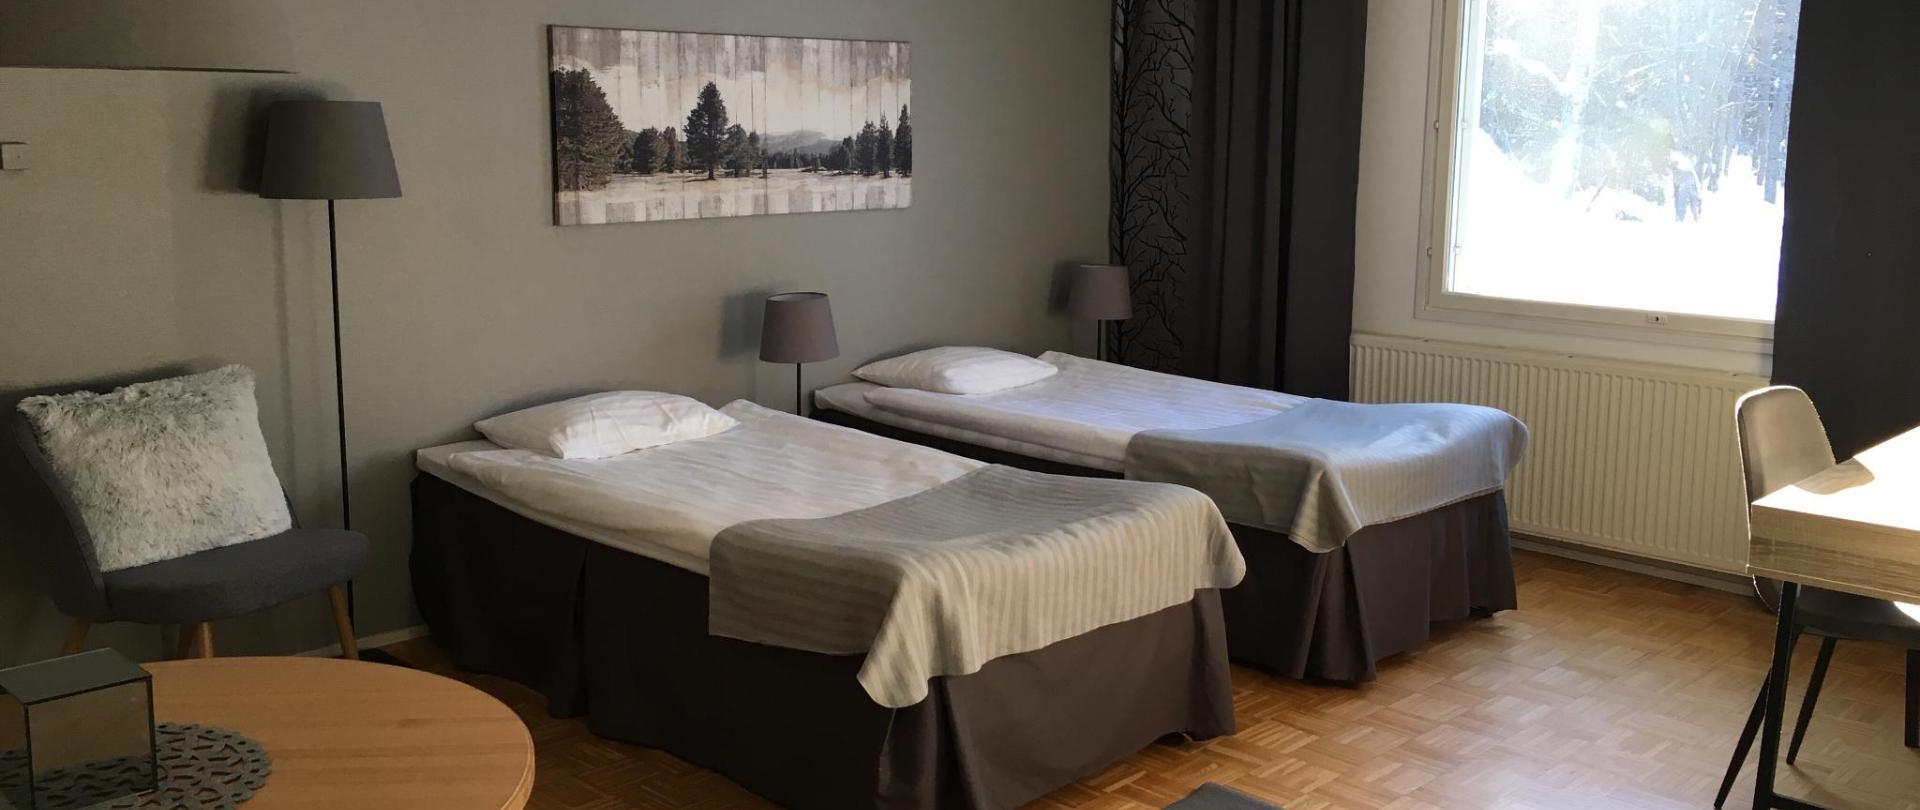 Hotel Yöpuu